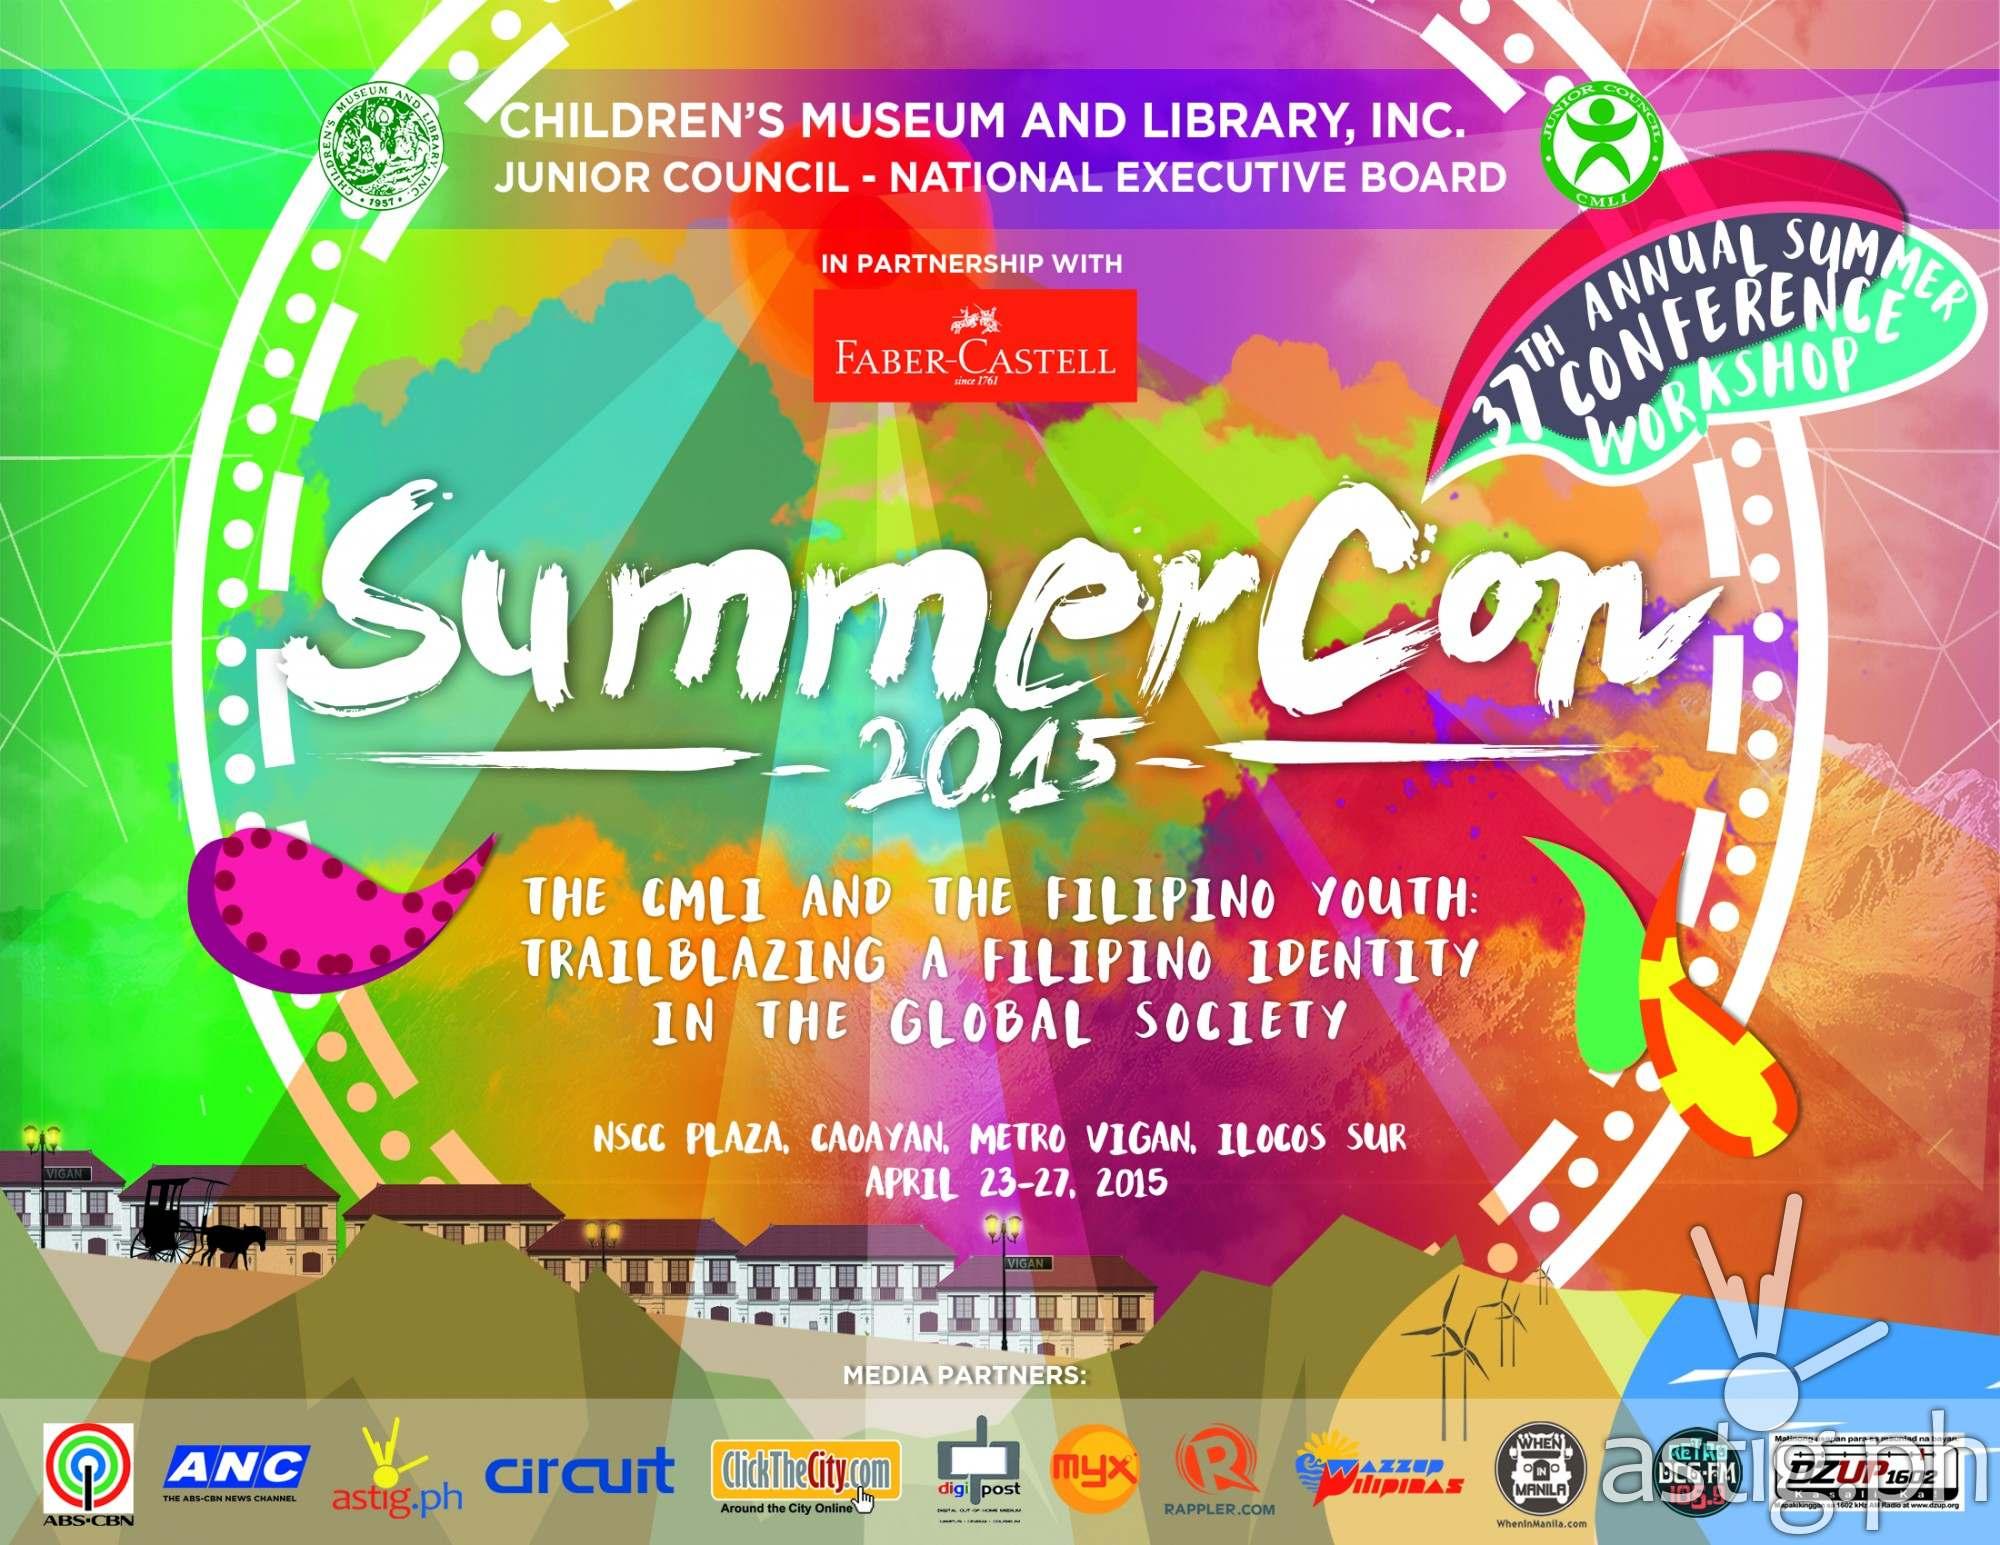 CMLI SummerCon 2015